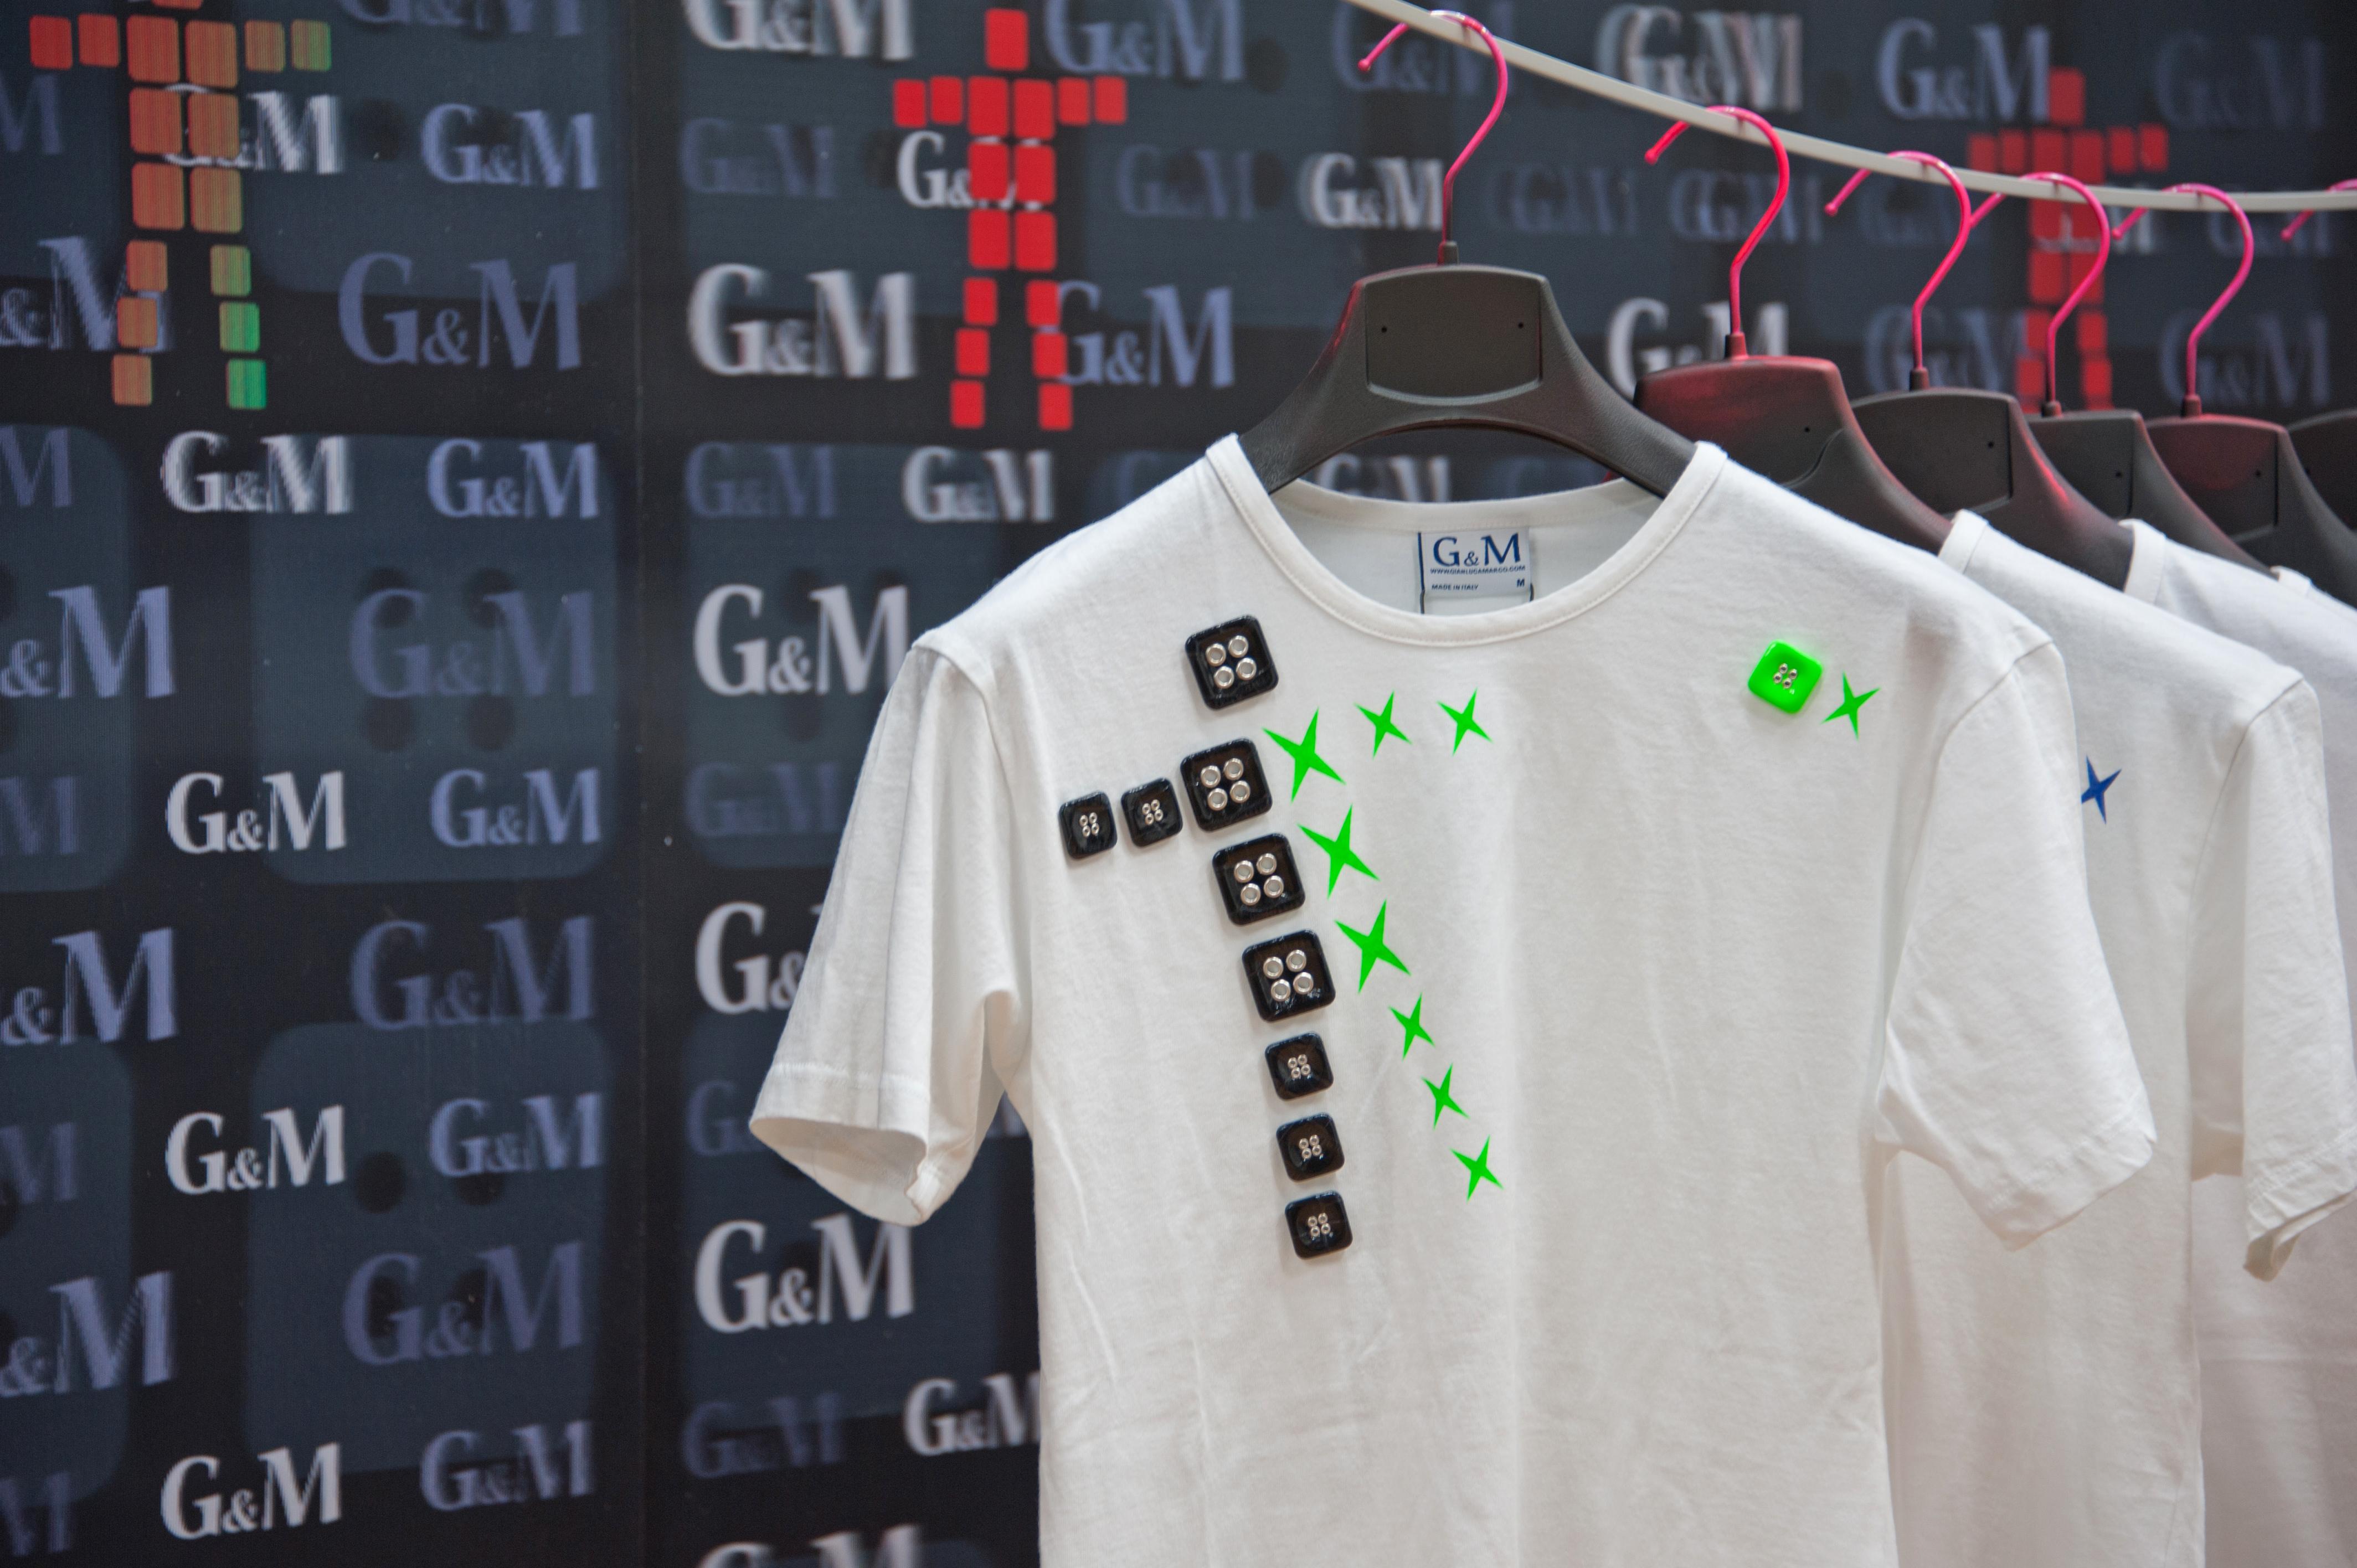 Vincenzo Marsiglia + G&M, T-shirt d'artista per campagna abbonamenti Espoarte 2013